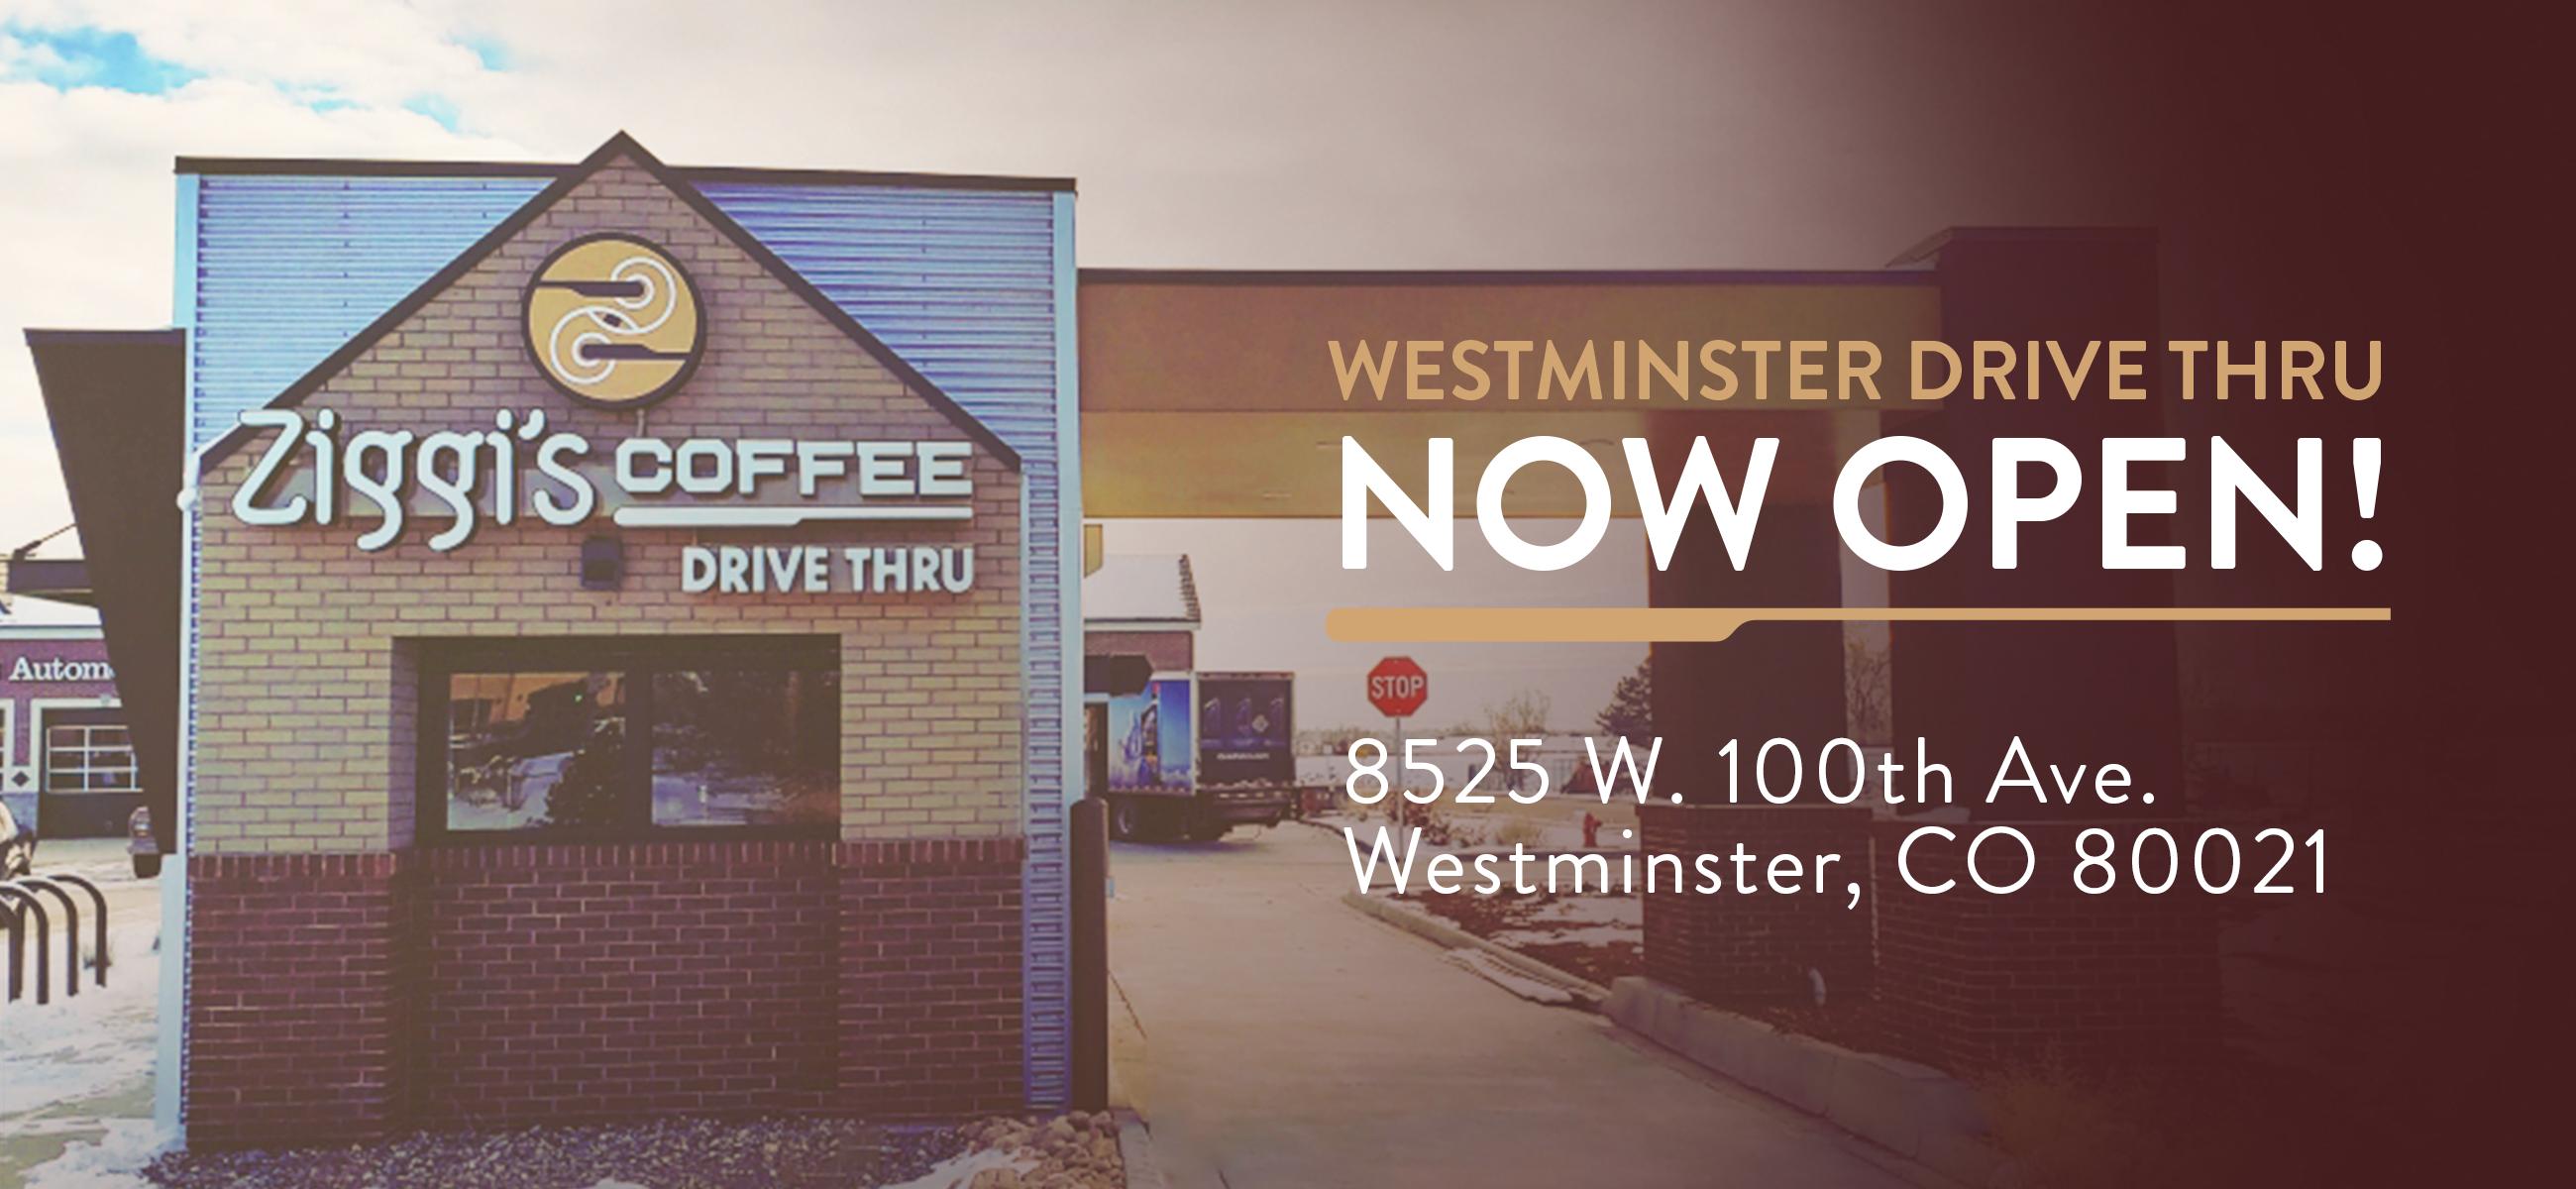 Photo of new Ziggi's Coffee Westminster drive thru location